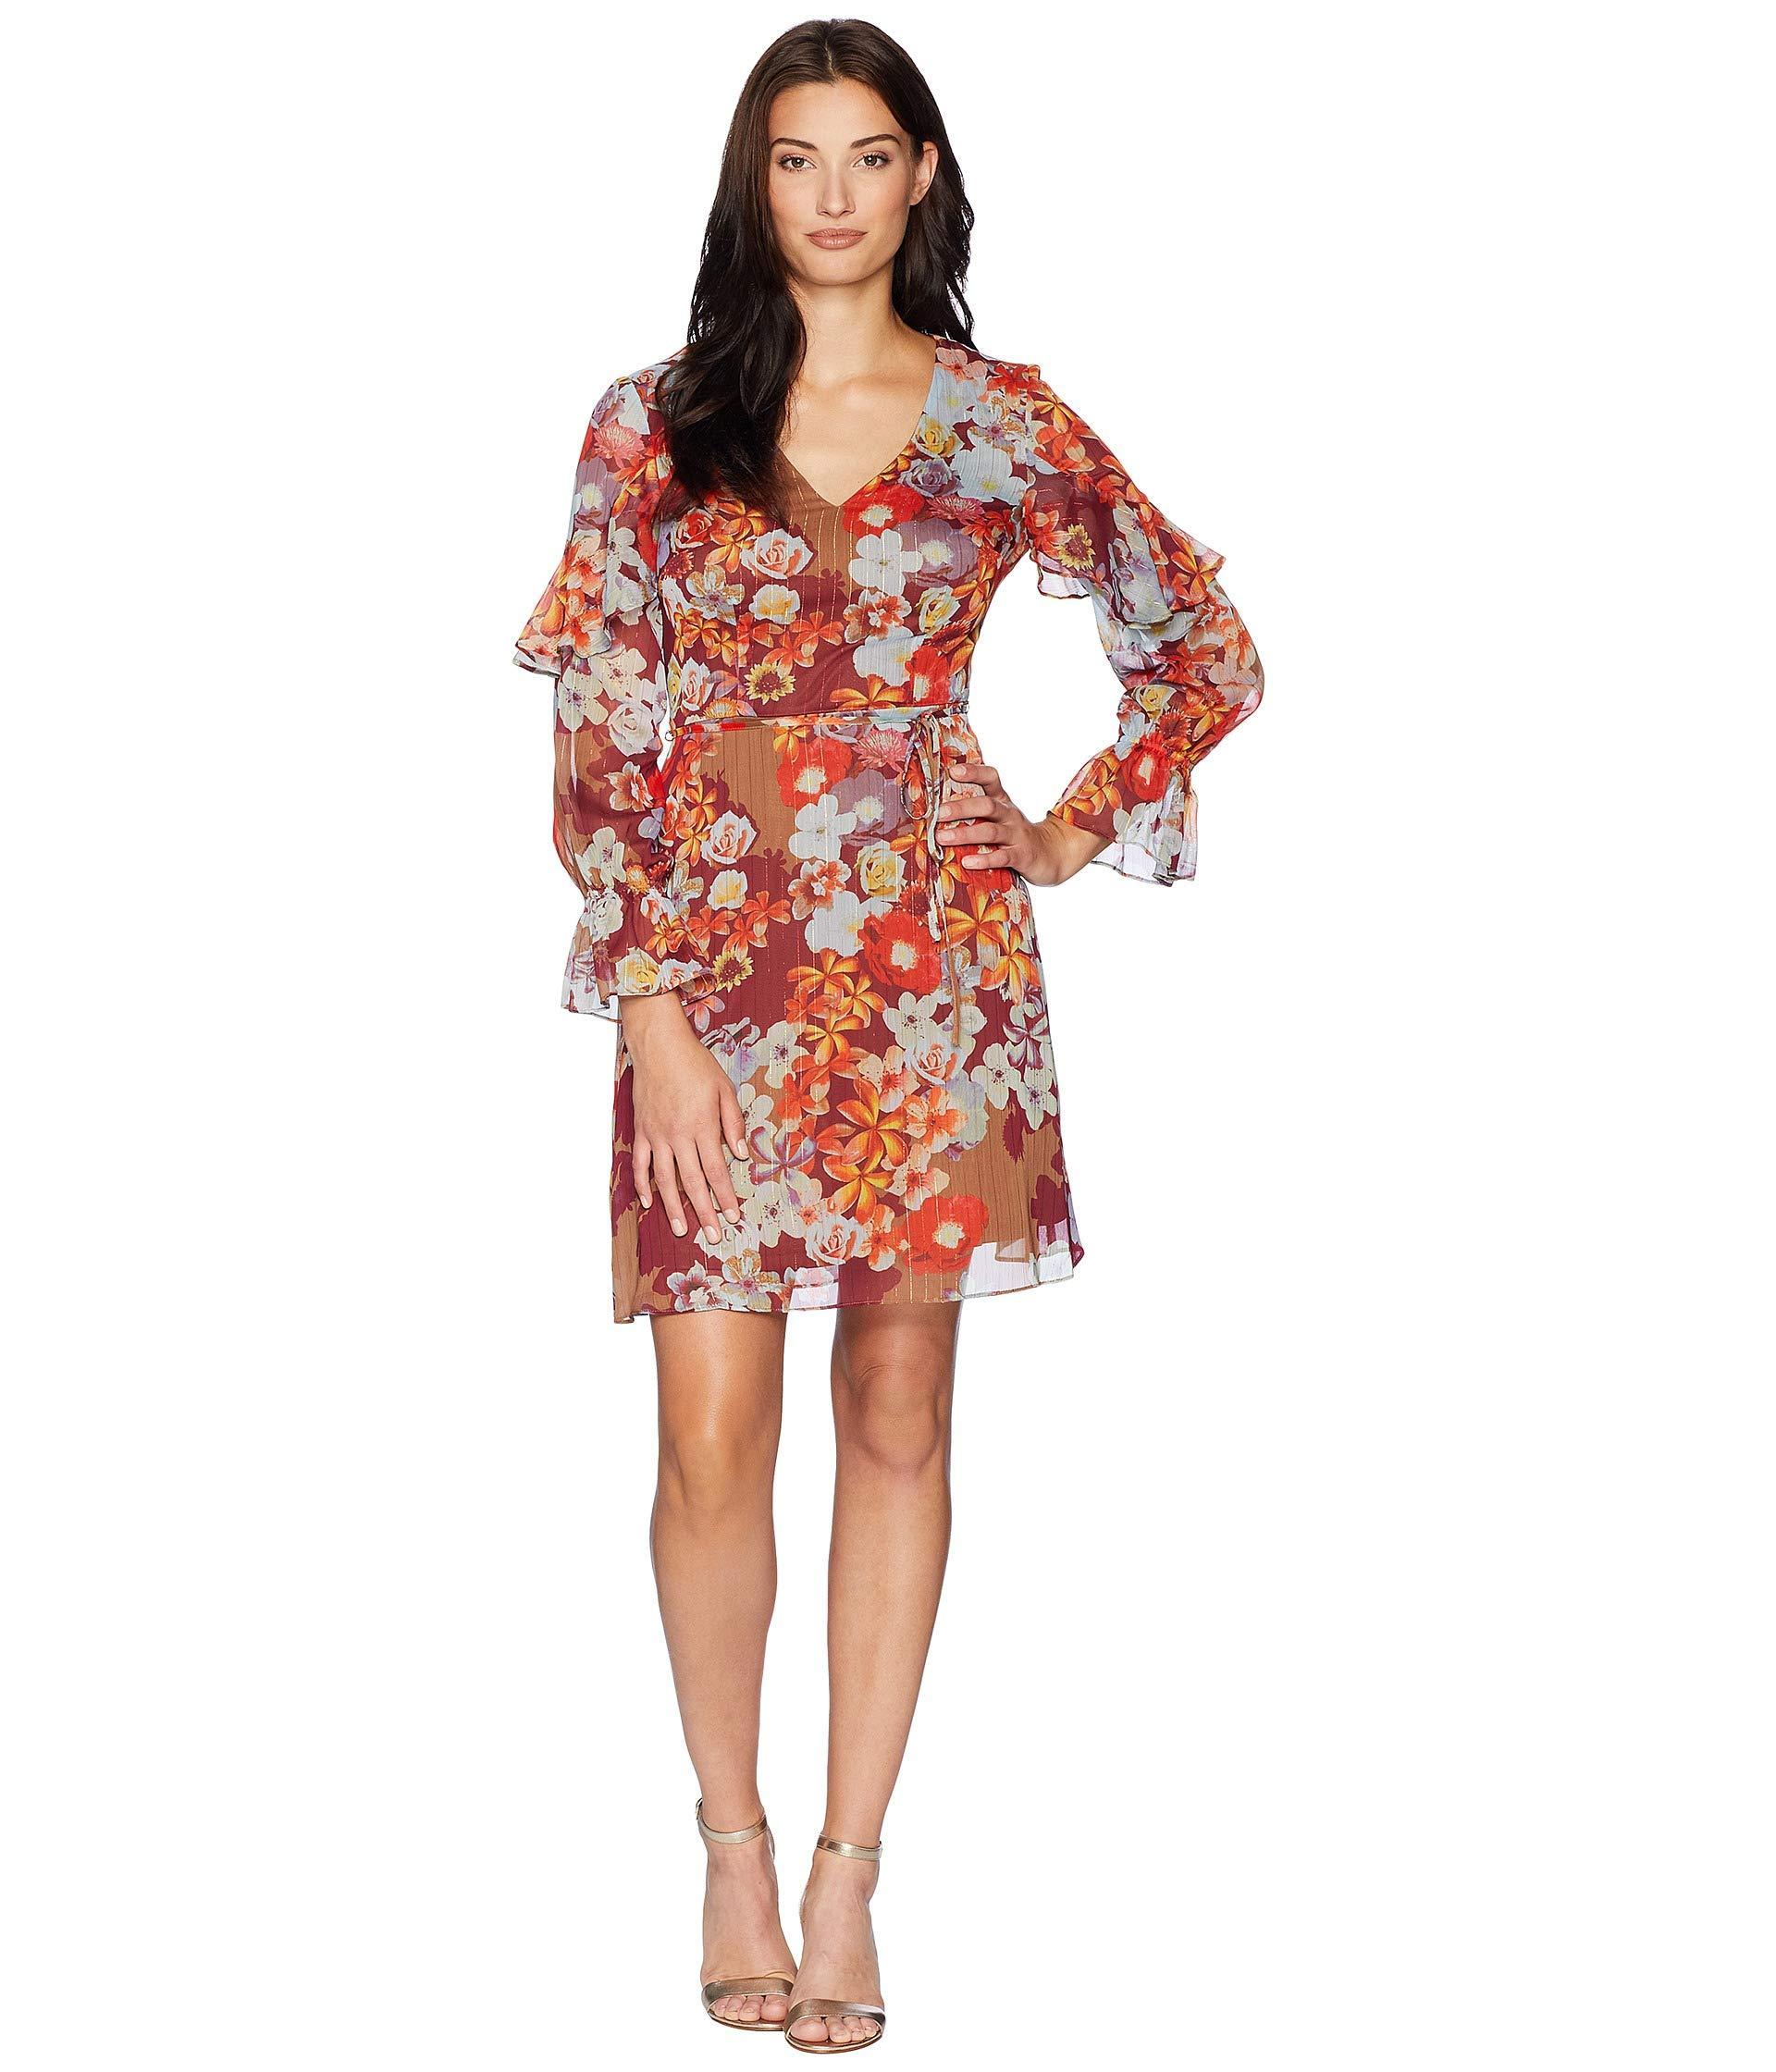 904cb502031 Adrianna Papell. Women s Red Floral Print Metallic Stripe Chiffon Ruffle Sleeve  Dress